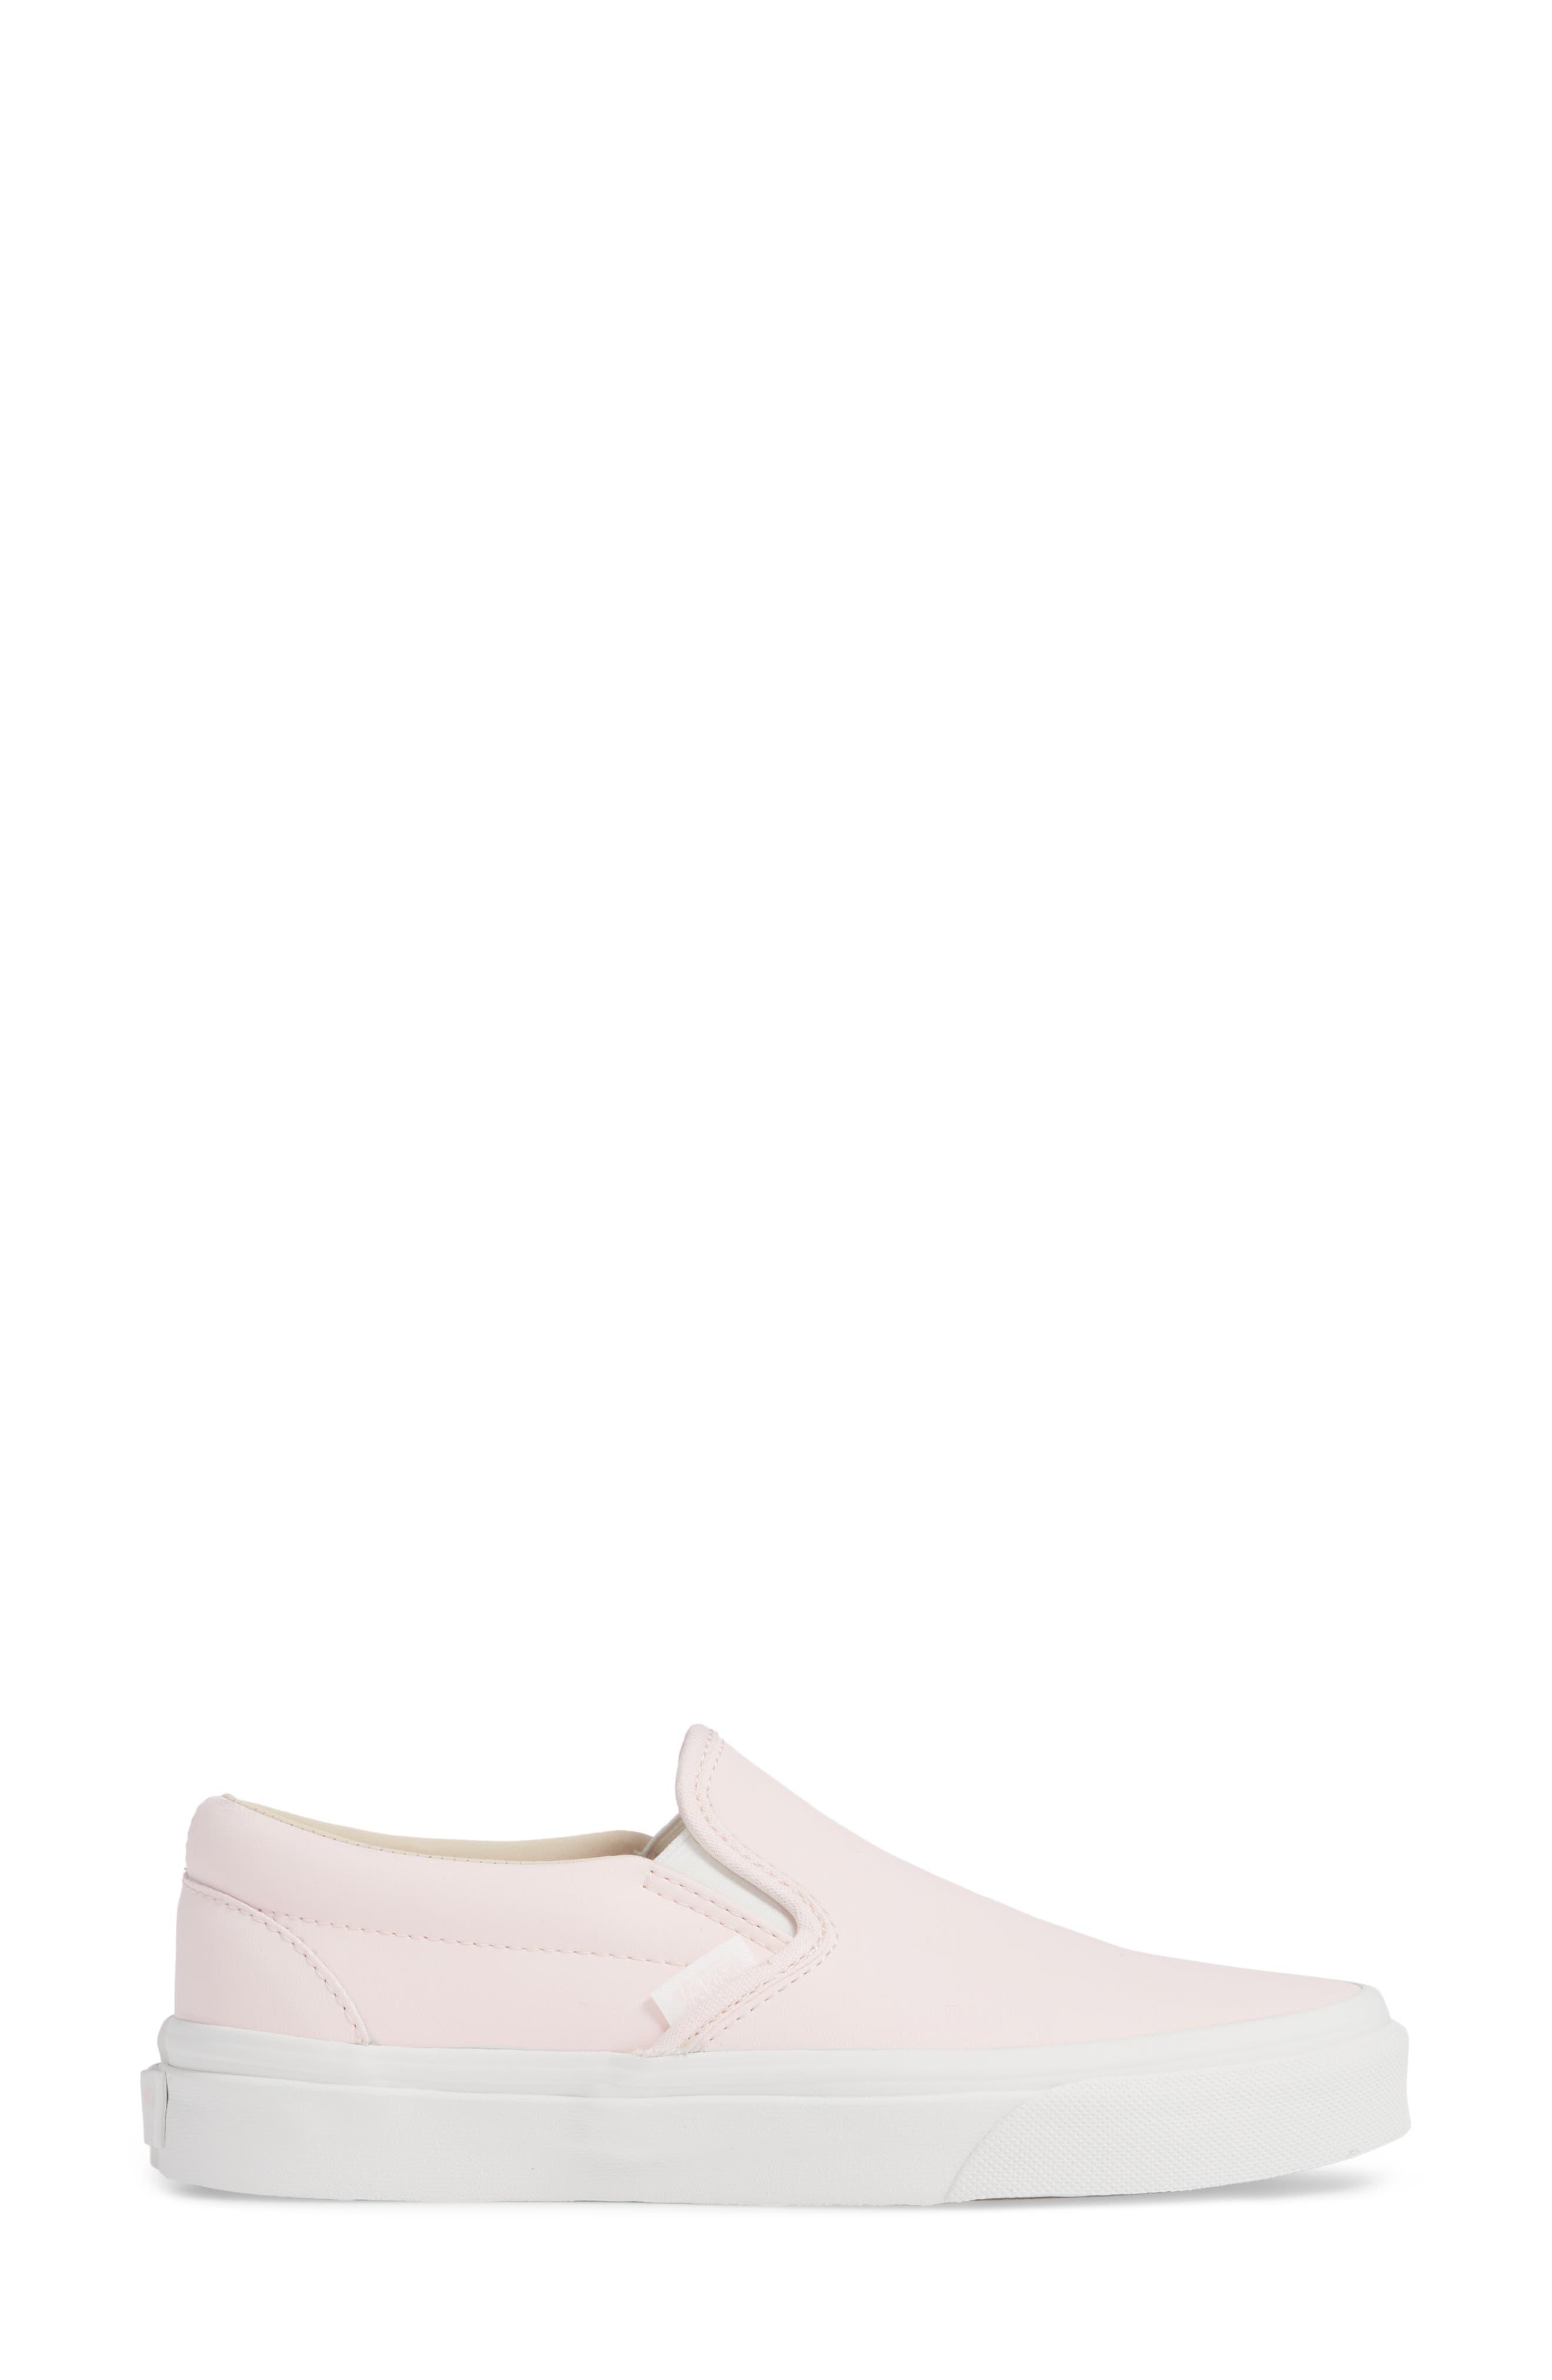 UA Classic Slip-On Sneaker,                             Alternate thumbnail 3, color,                             680